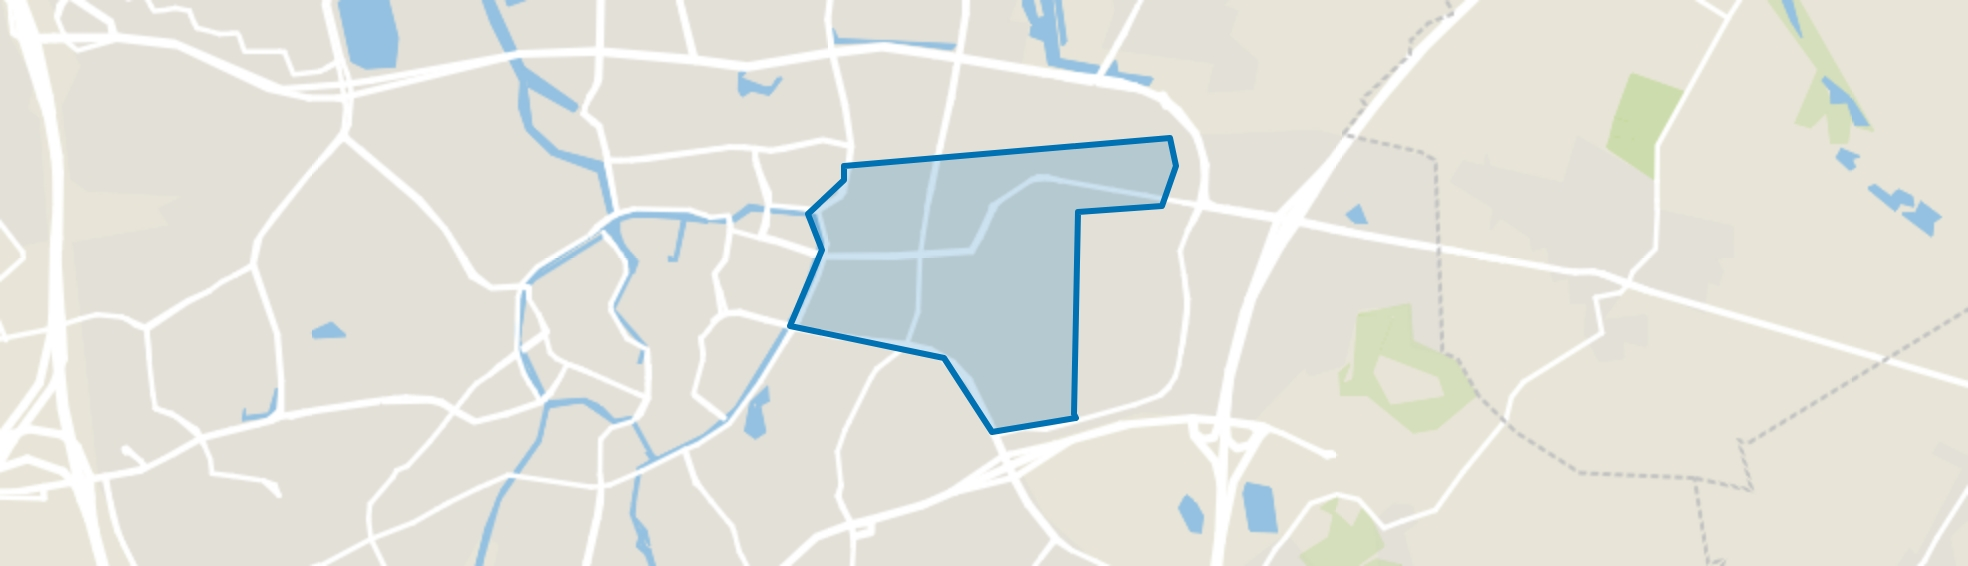 Brabantpark, Breda map